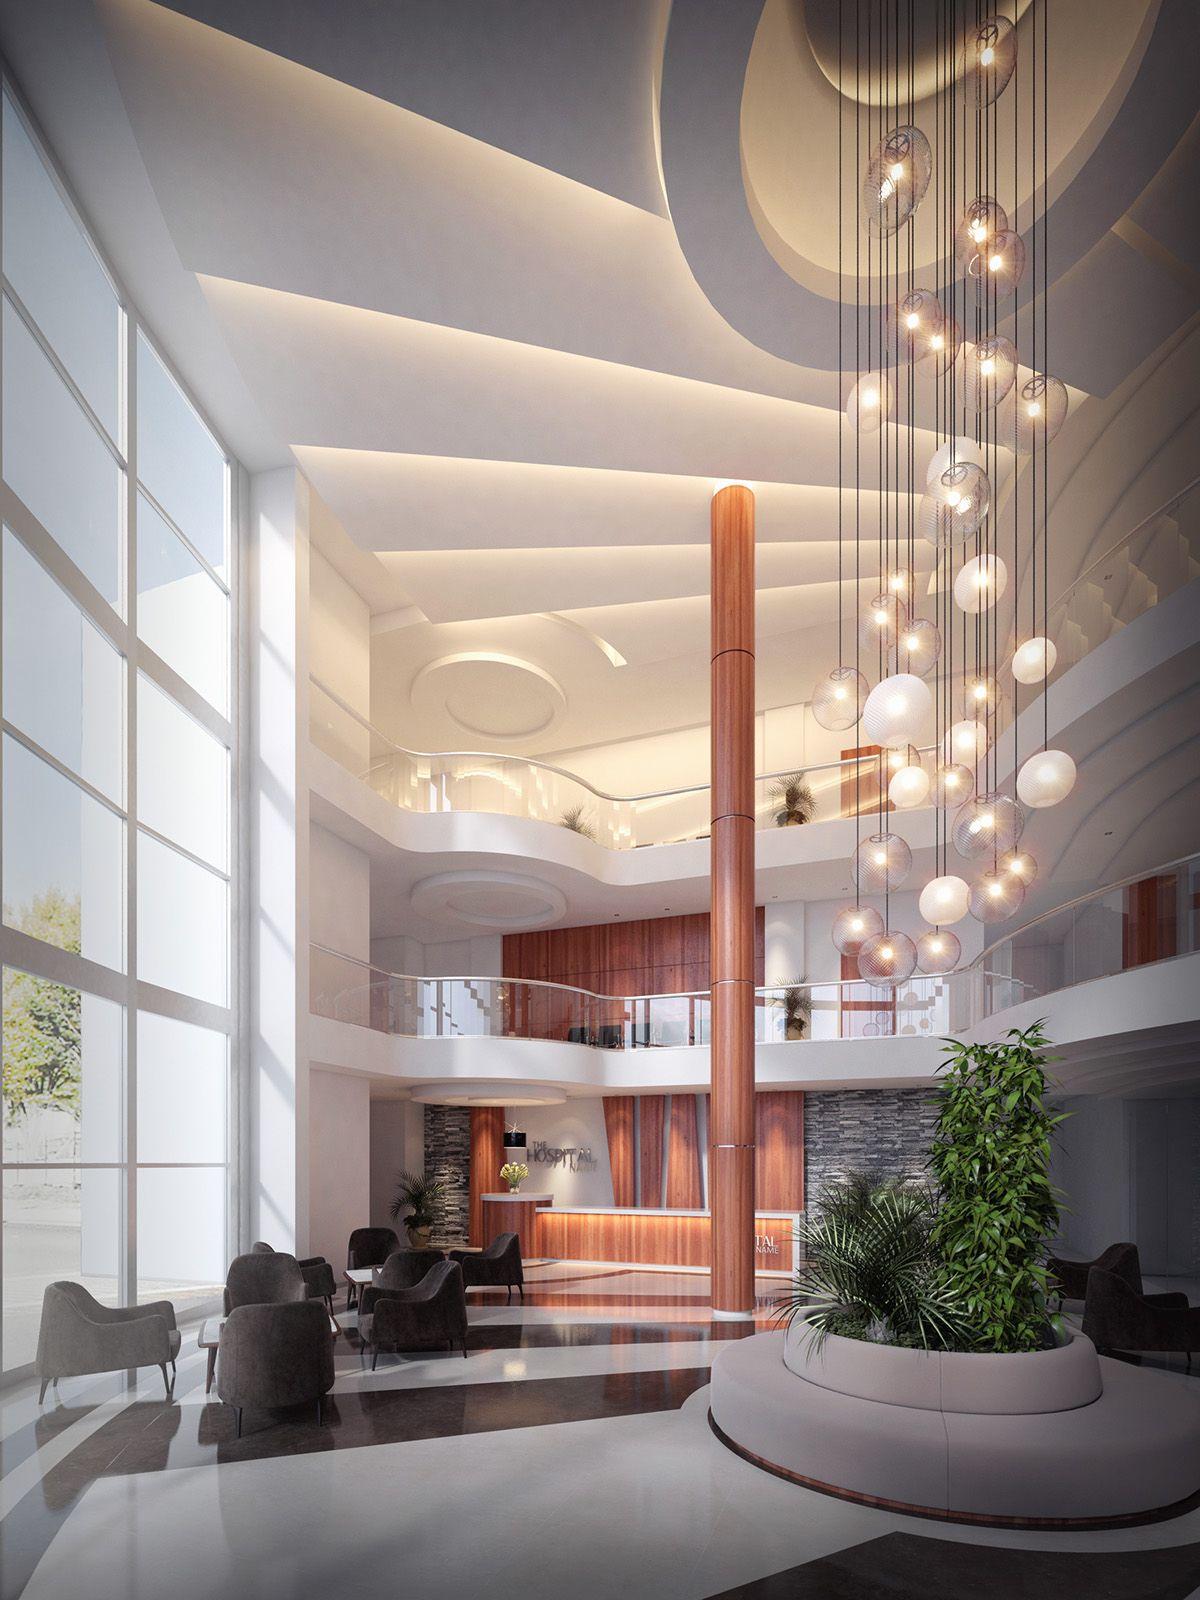 Hospital Entrance lobby design | lobi, 2018 | Pinterest ...